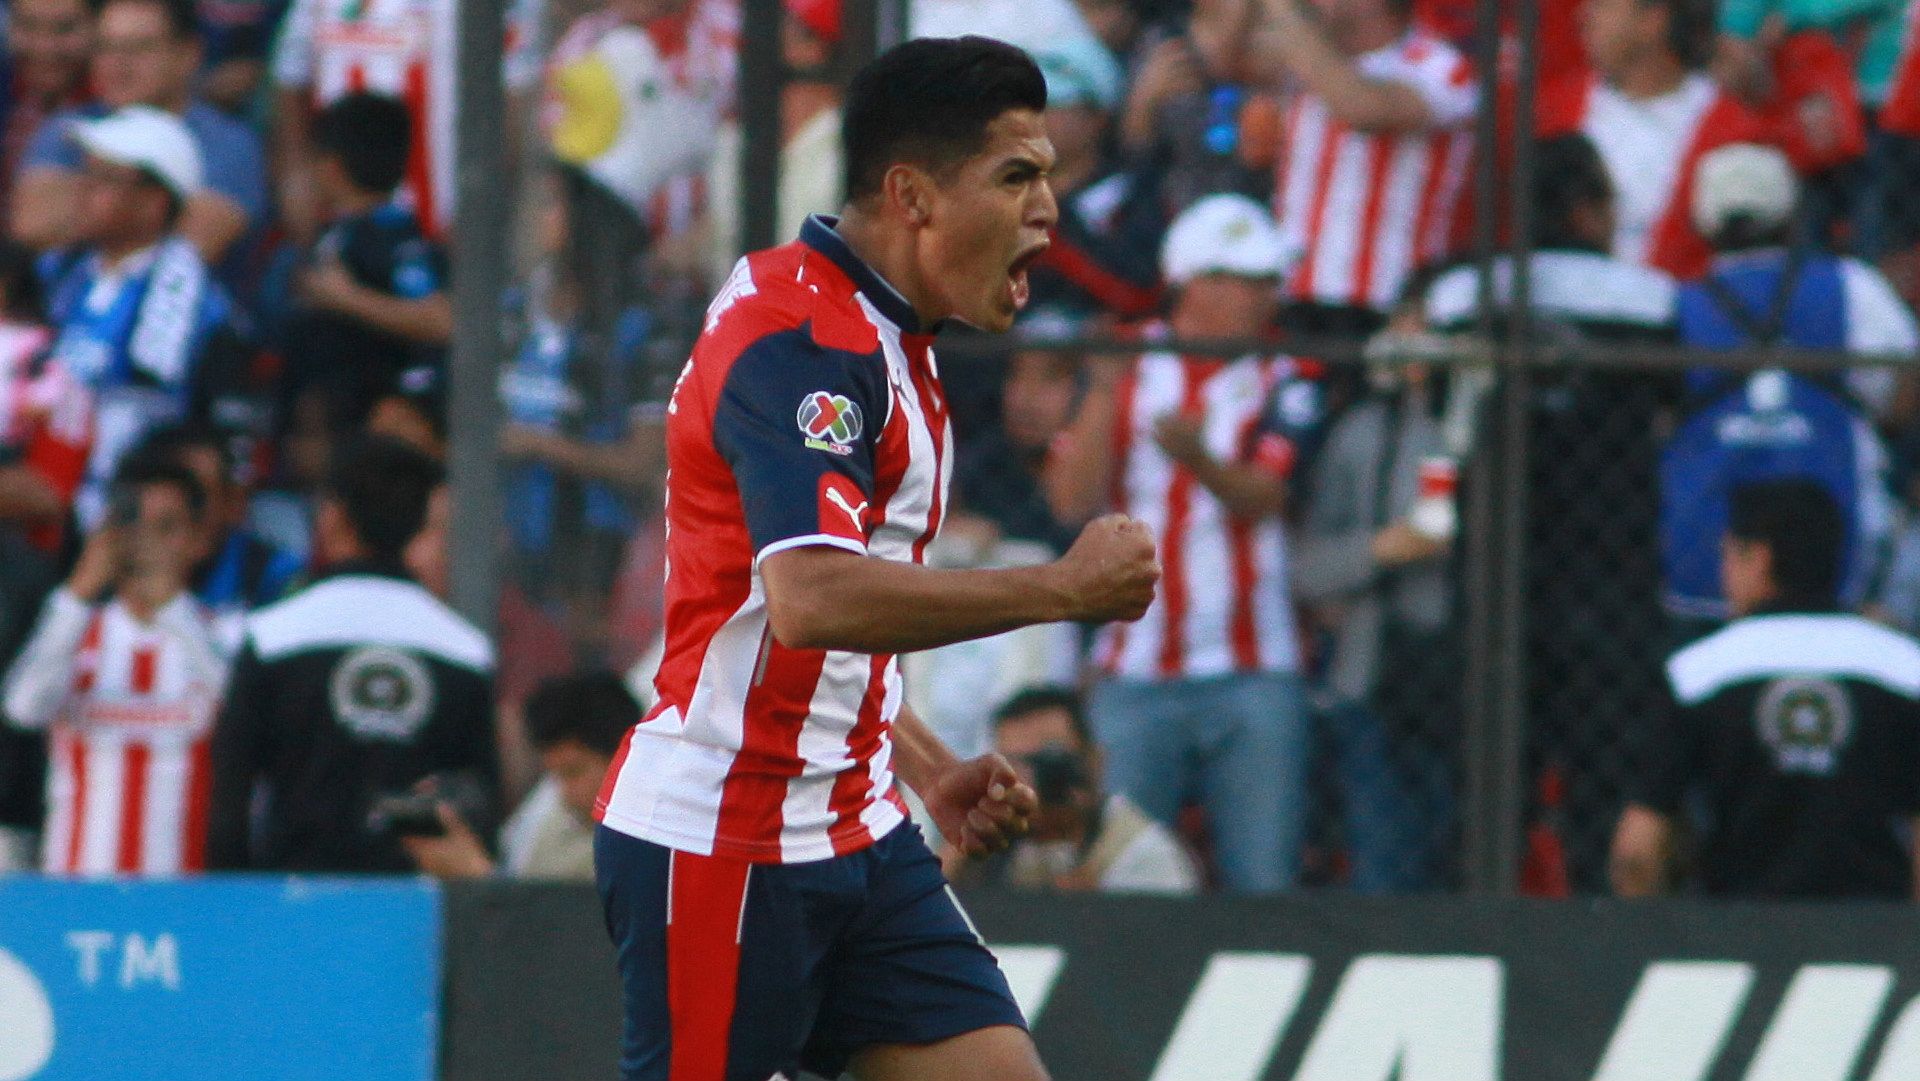 Jesus Sanchez Chivas